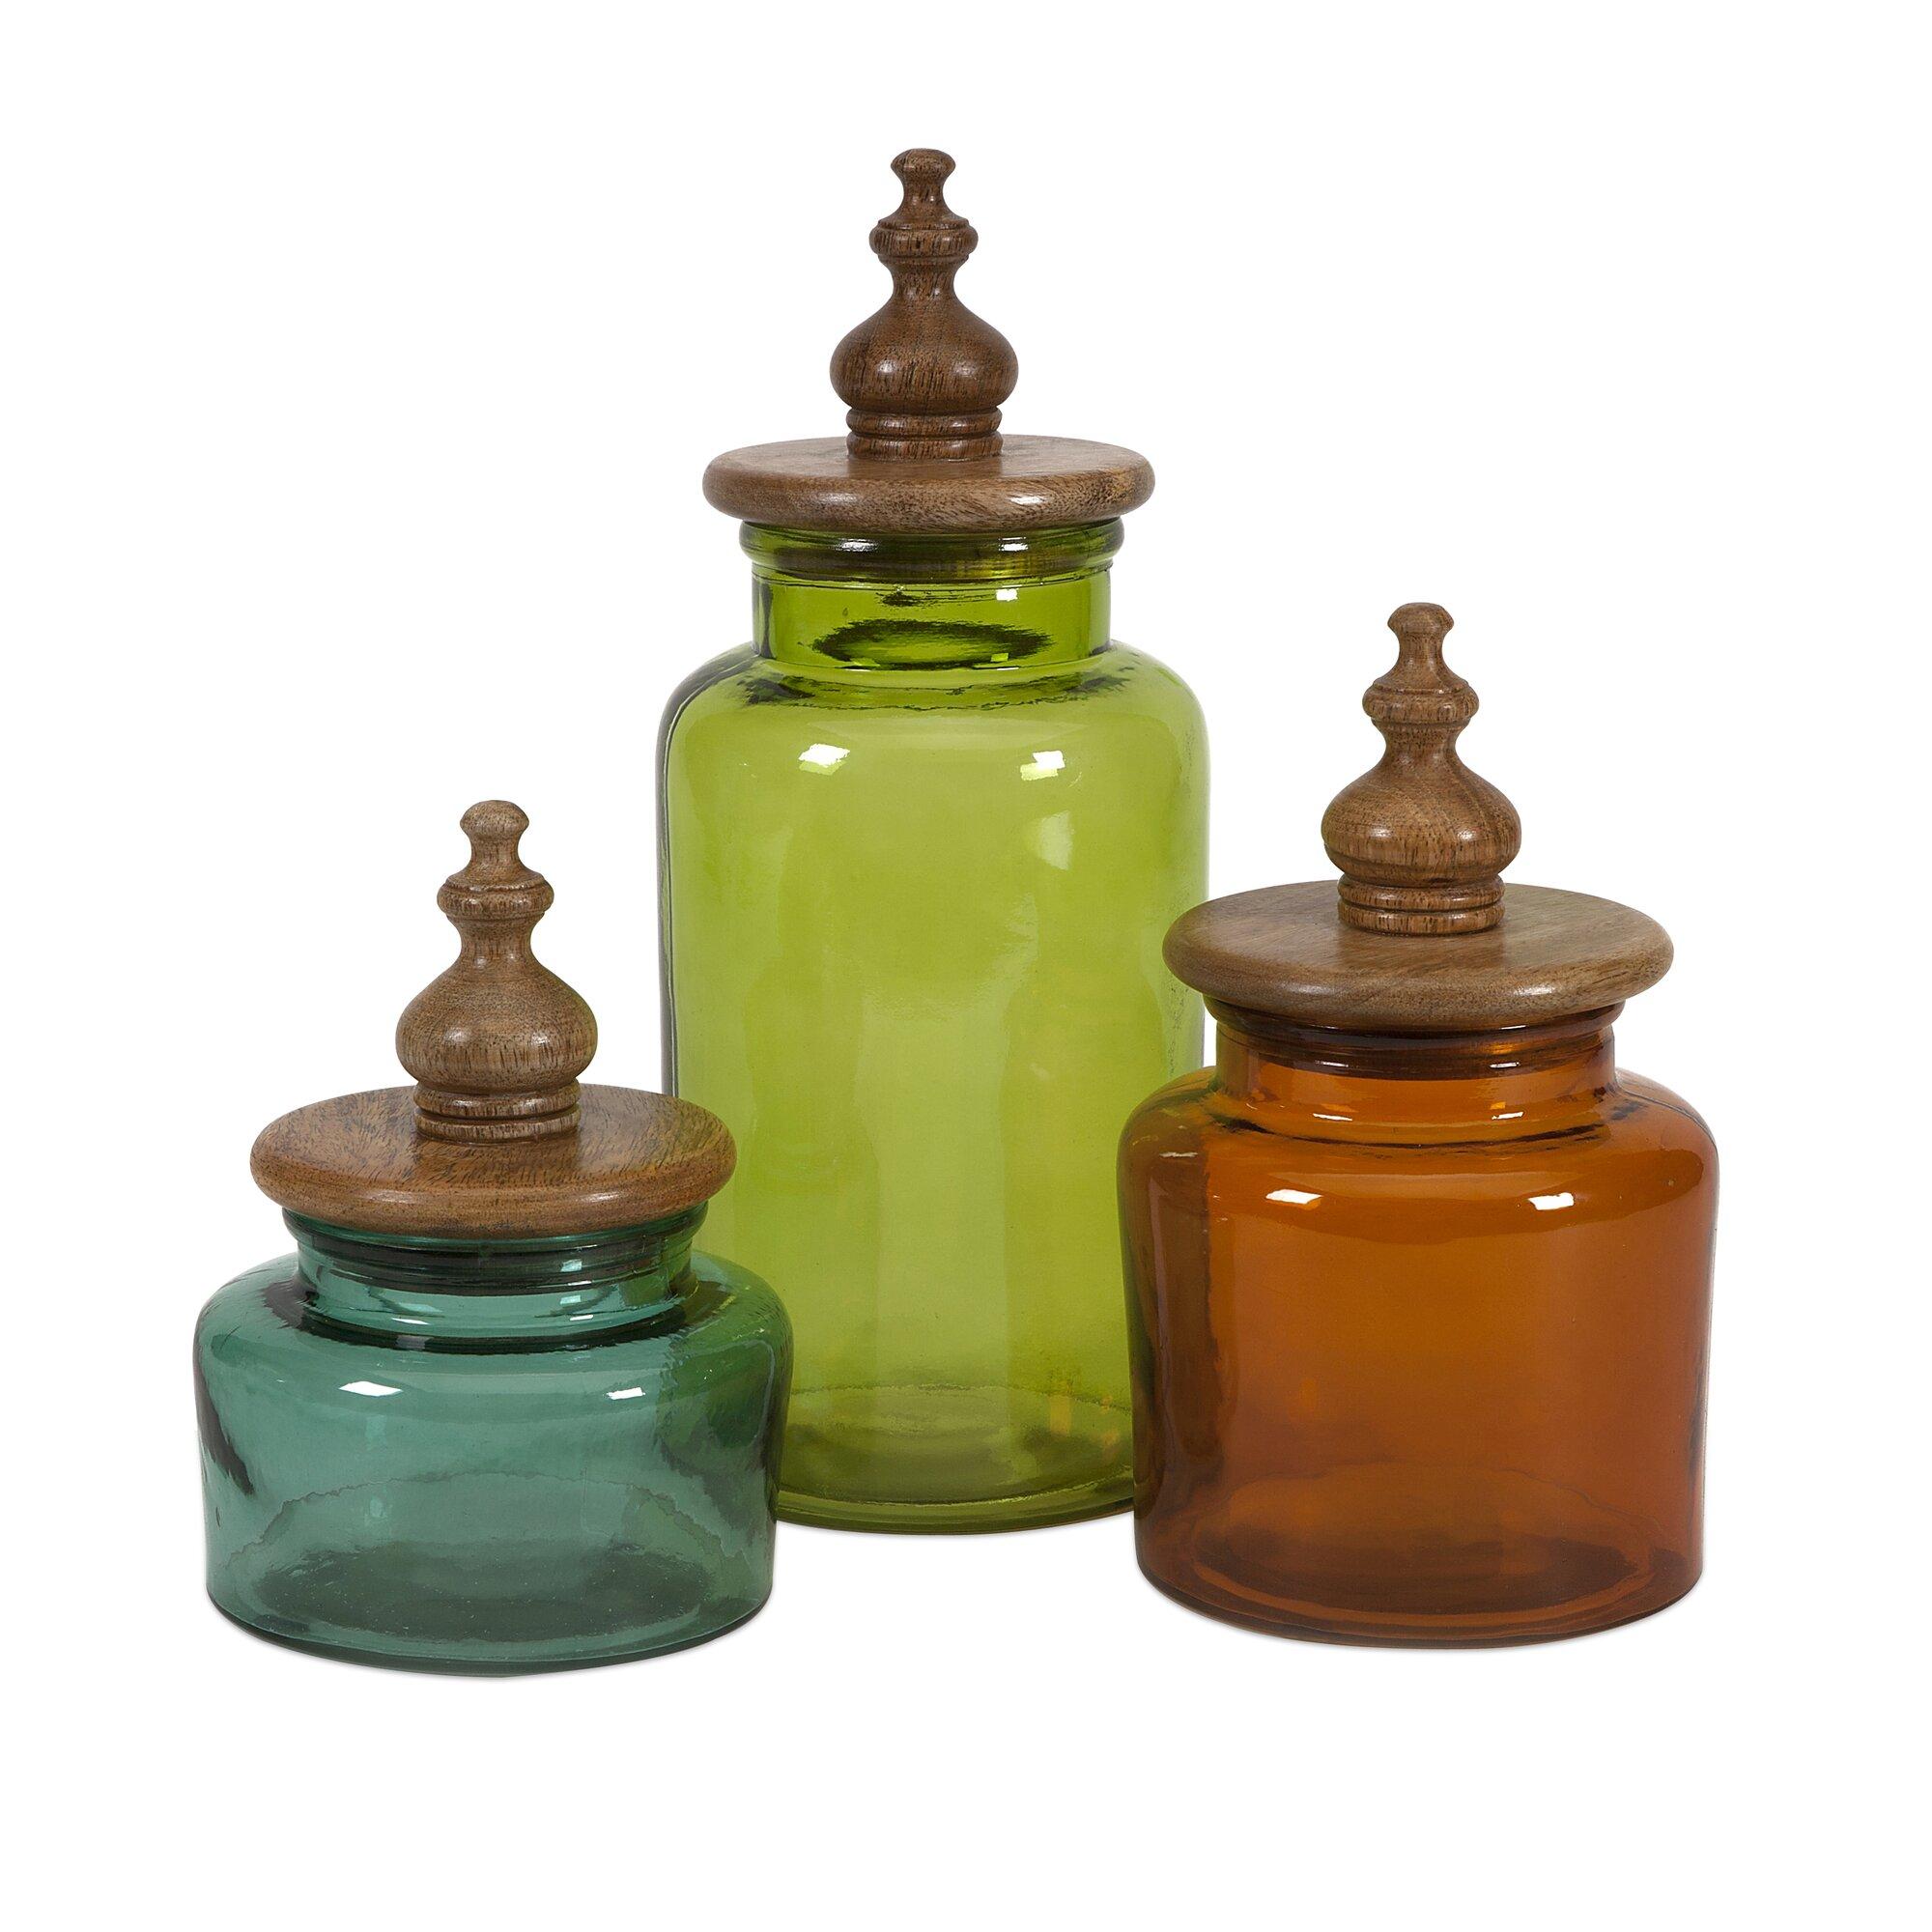 imax saburo 3 piece kitchen canister set reviews wayfair